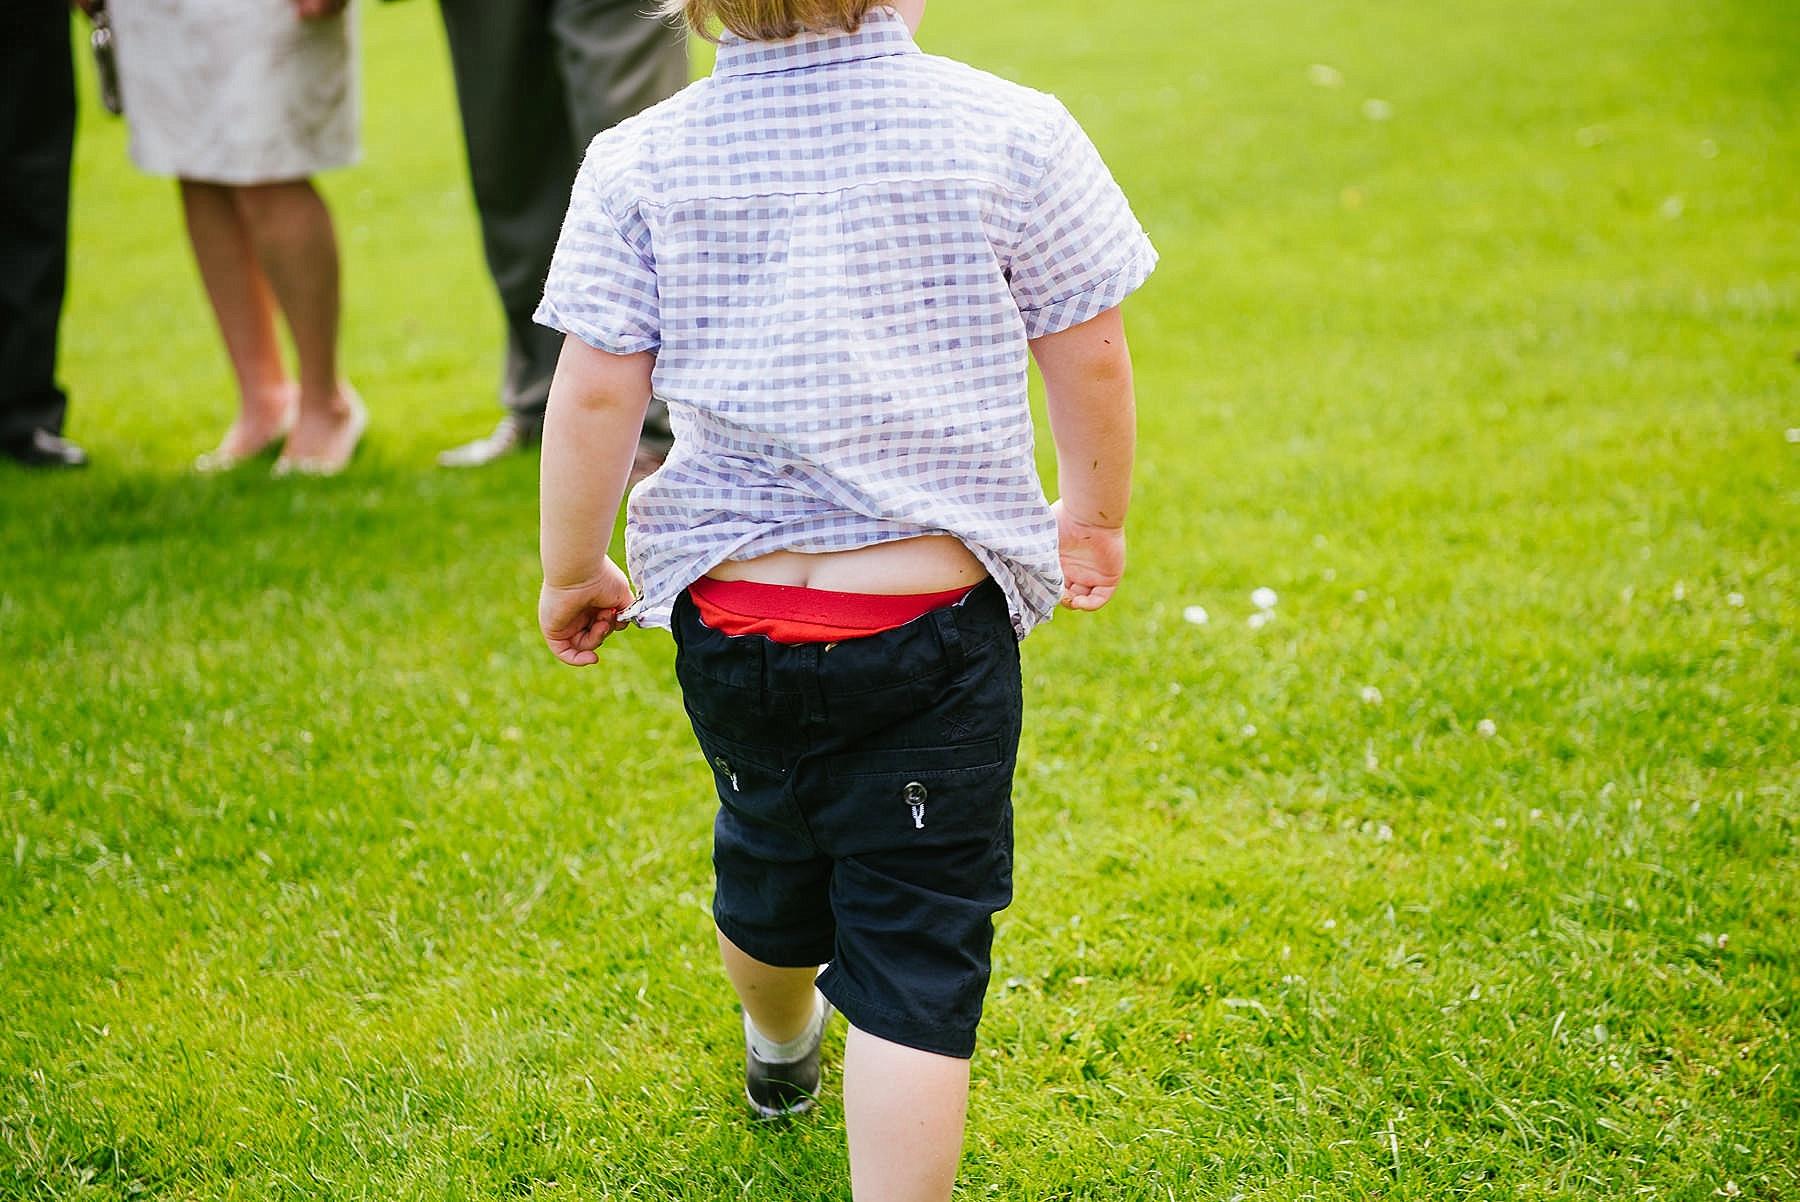 fun shot of child with shorts falling down